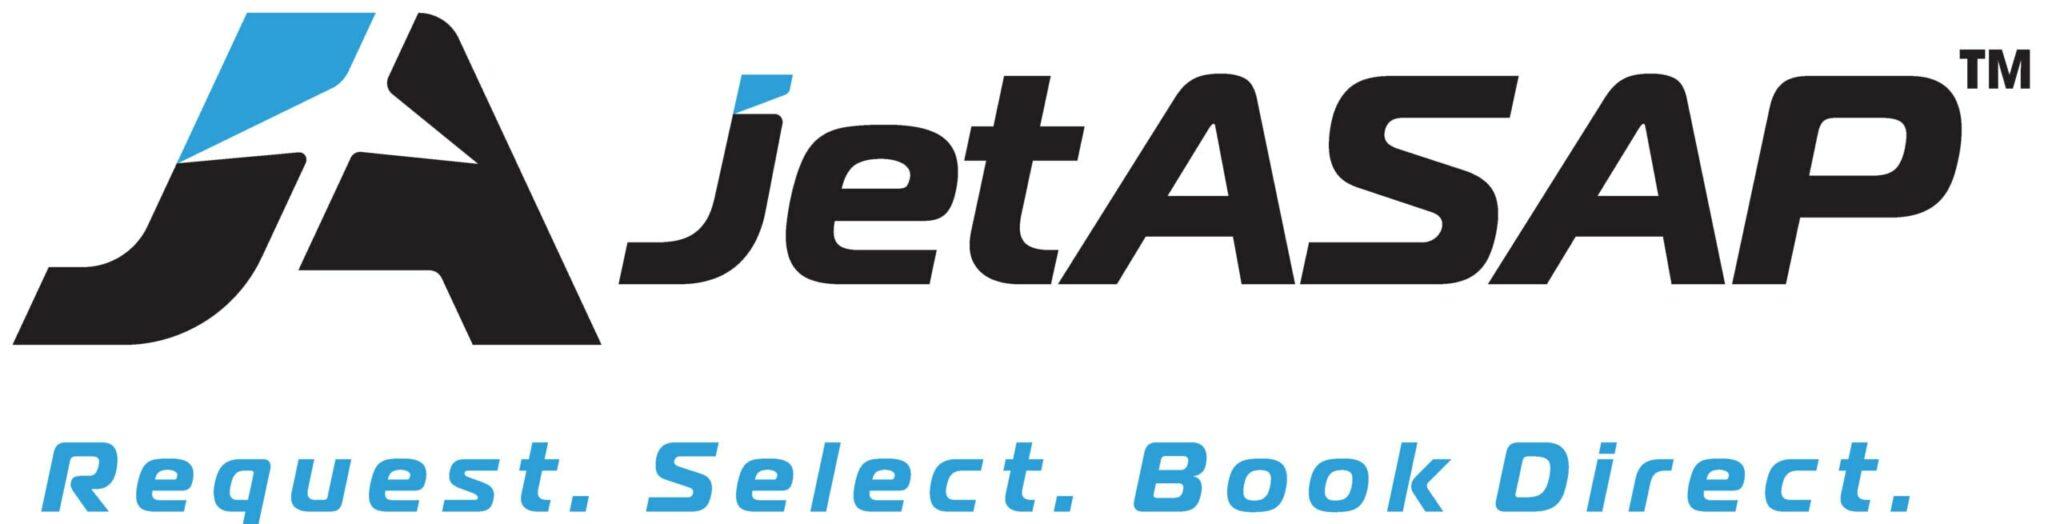 JetASAP logo blue black b tag tm R2 scaled